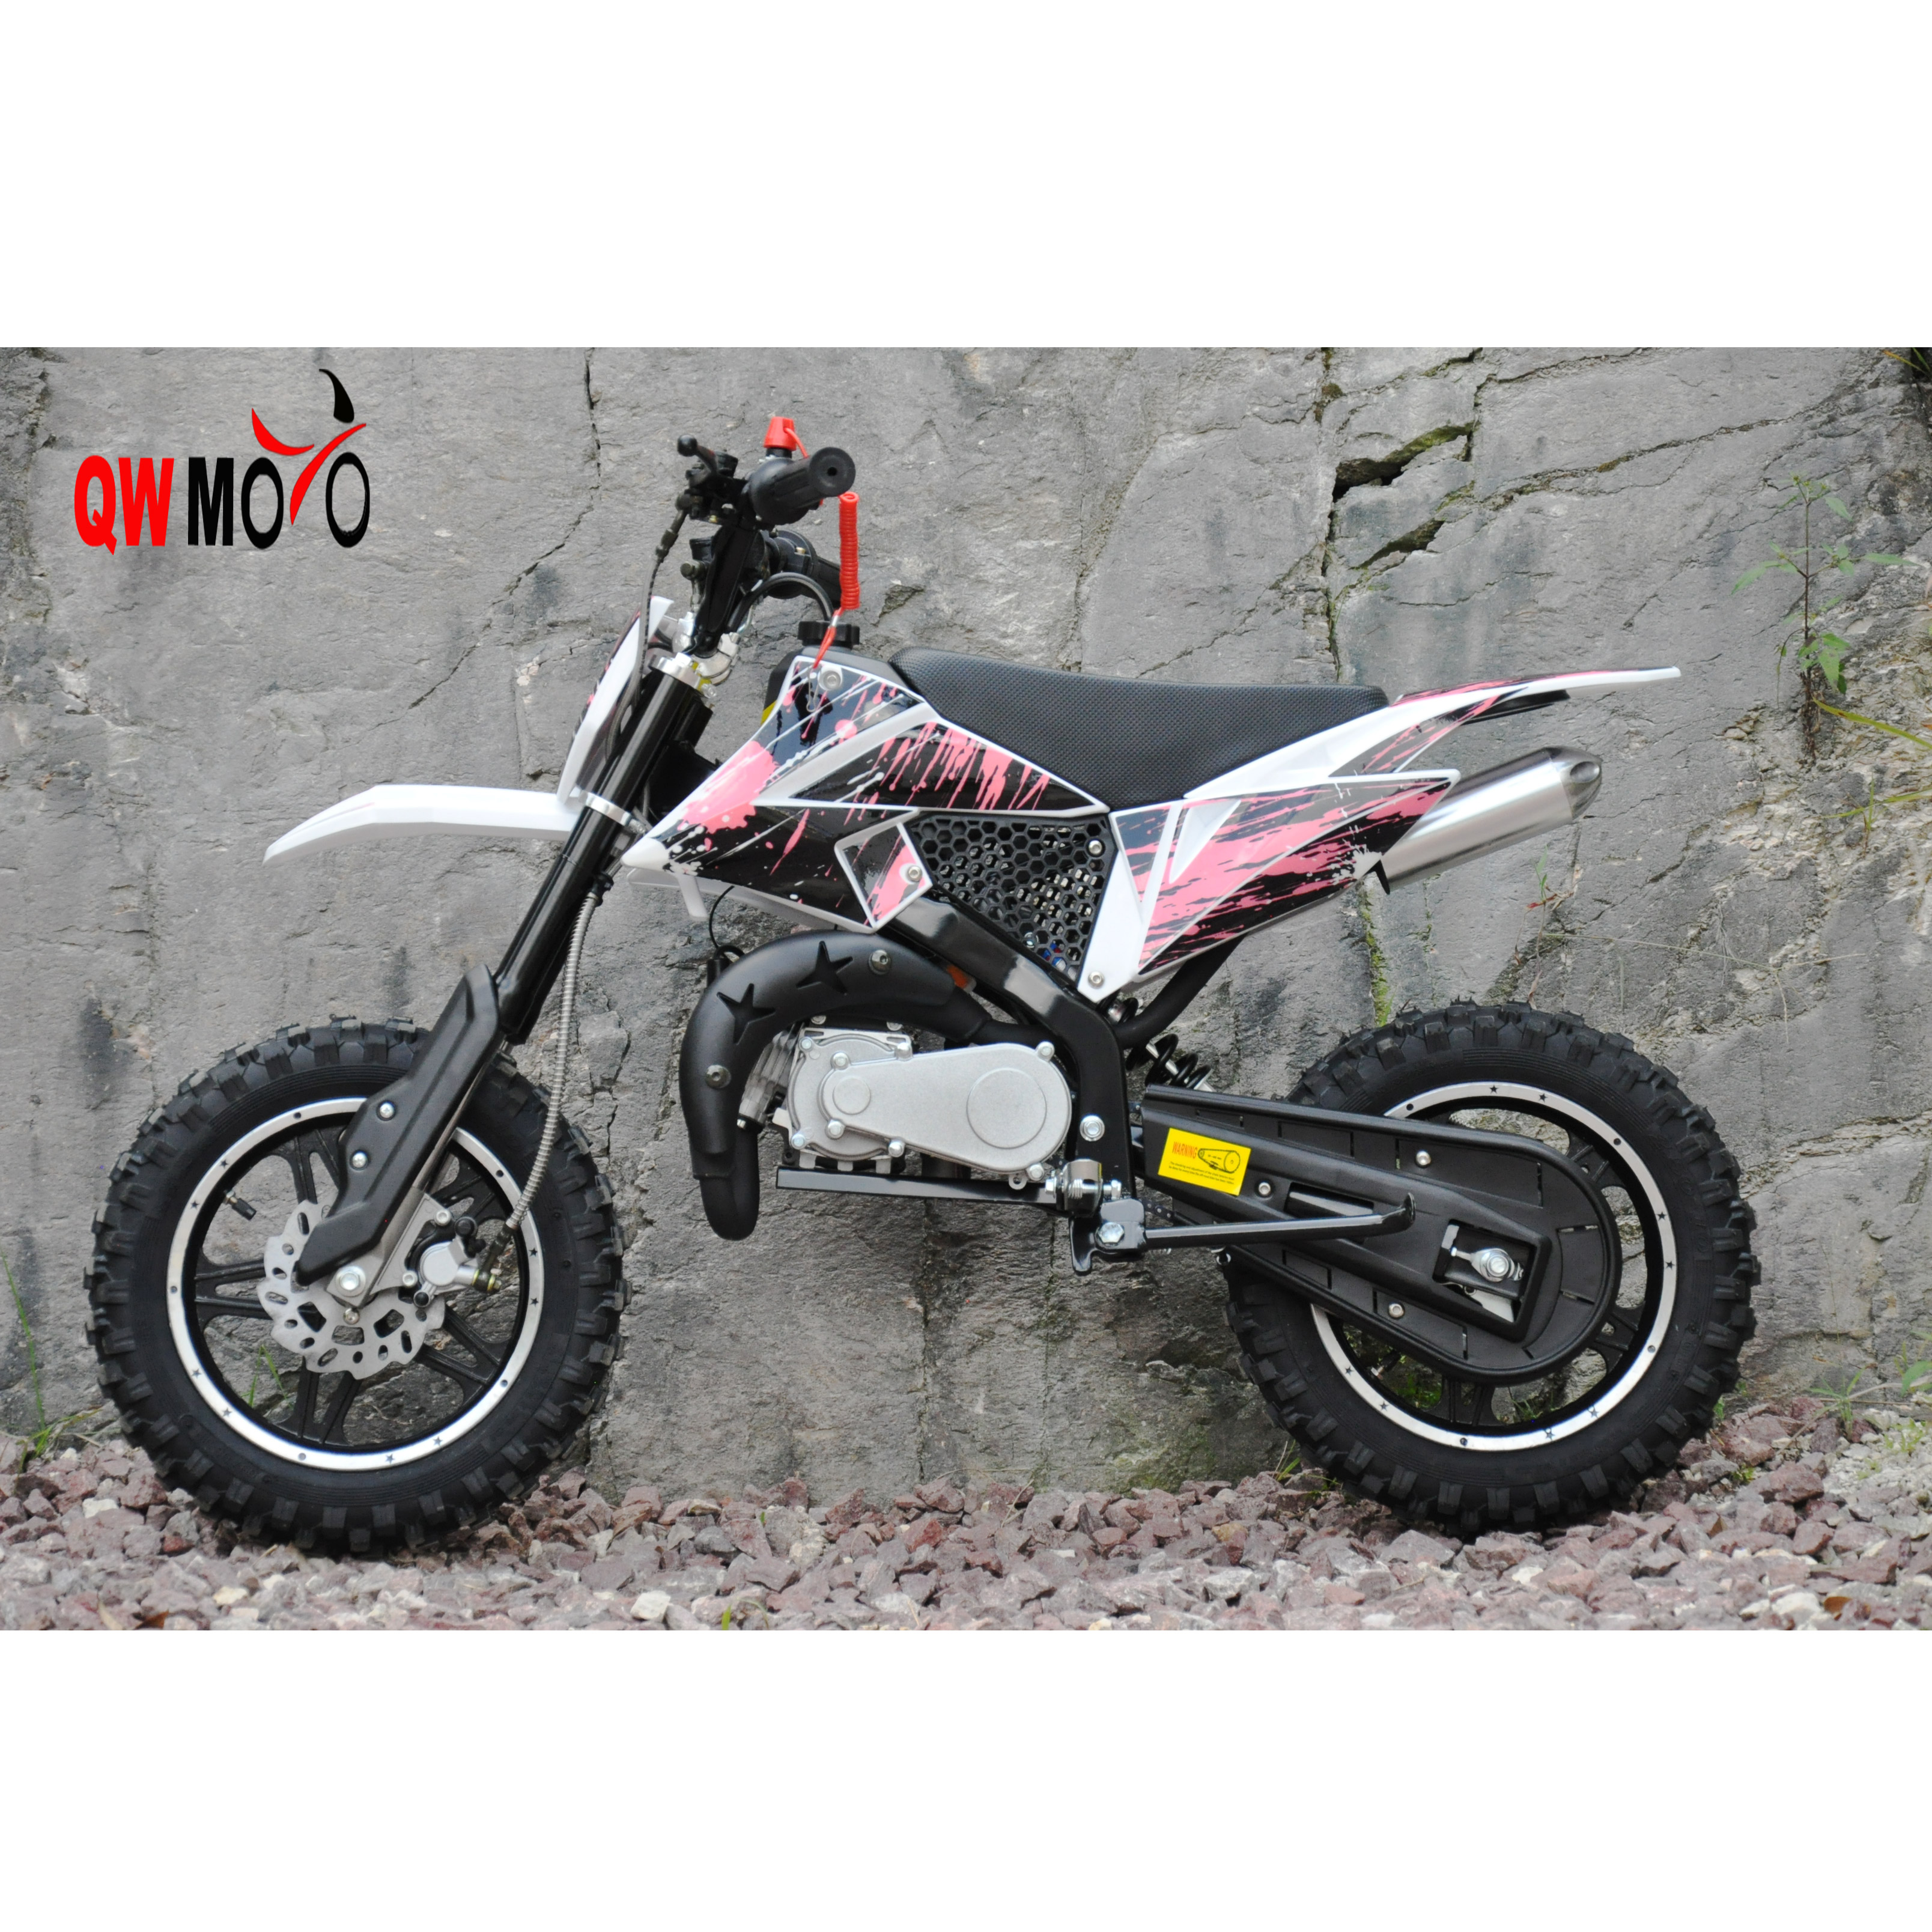 Qwmoto 2 Stroke Dirt Bike 50cc Toys Mini Dirt Bike 49cc Mini Moto Cross Pocket Bike Buy Dirt Bike 50cc Toys Mini Dirt Bike Mini Dirt Bike Product On